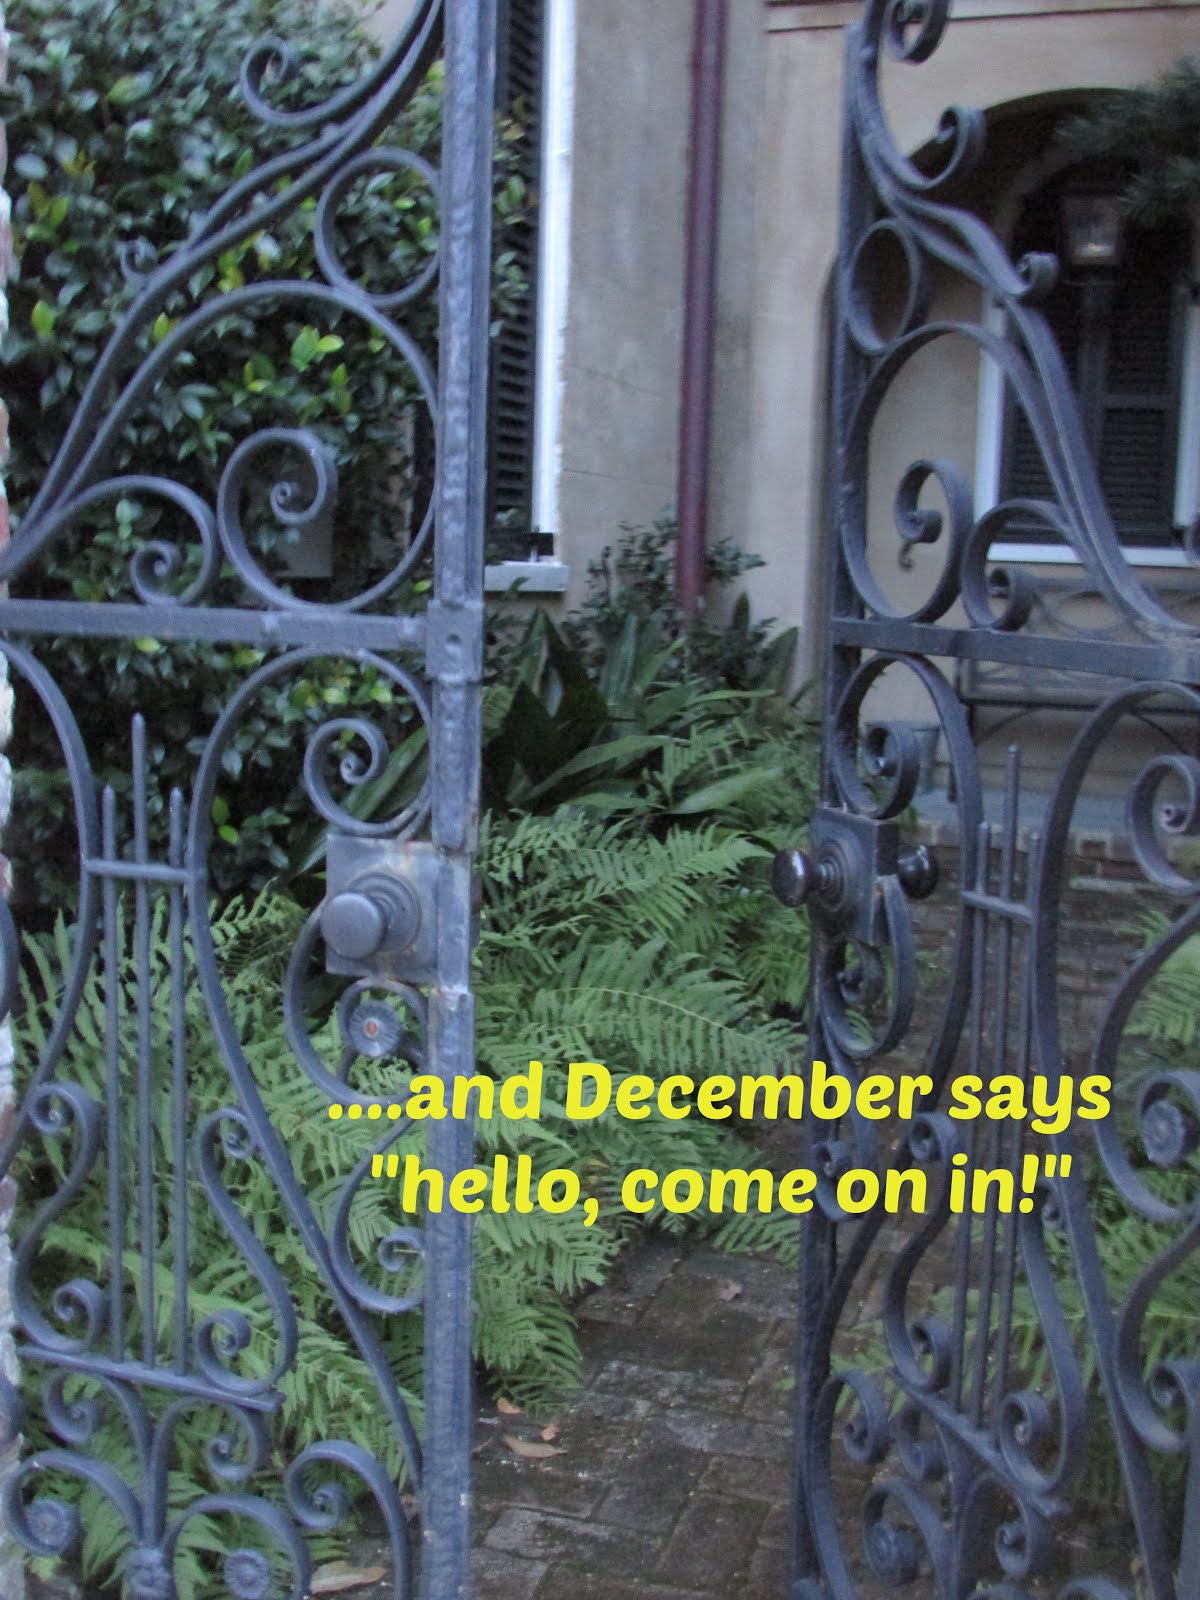 Welcome back, December!